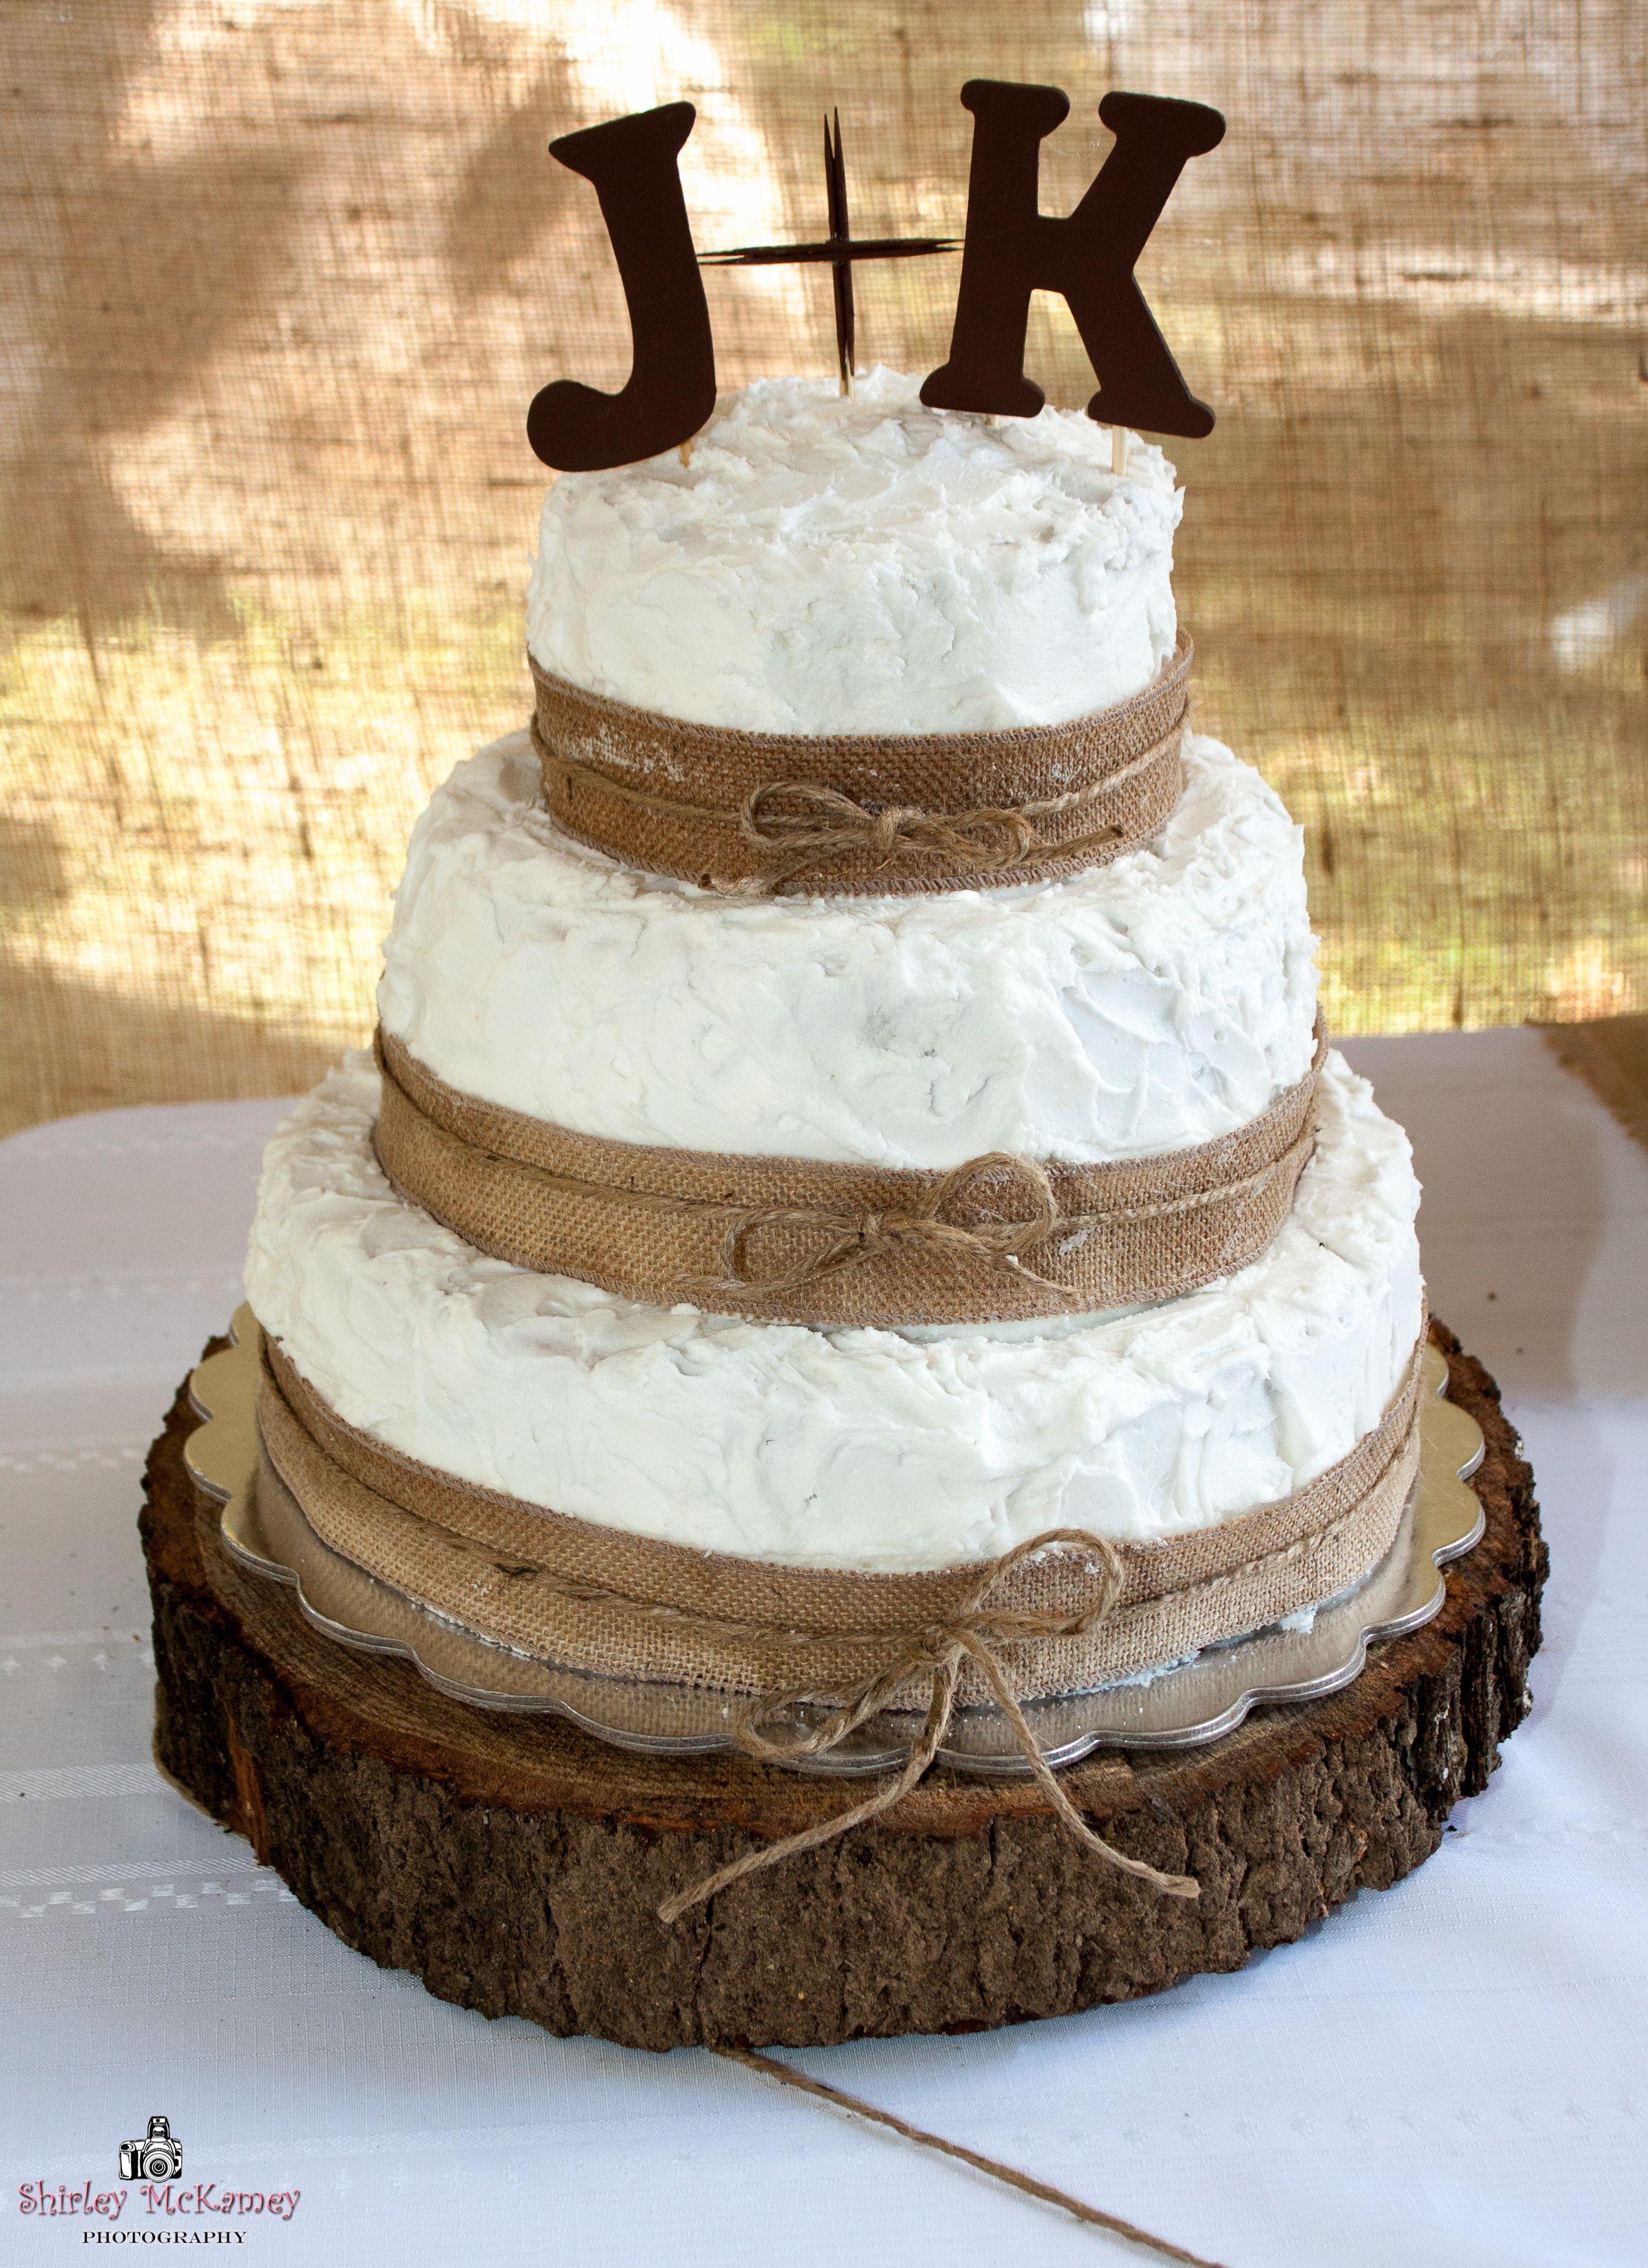 Wedding Cakes With Burlap Ribbon  3 Tier Wedding Cake… Decorated With Burlap Ribbon & Twine